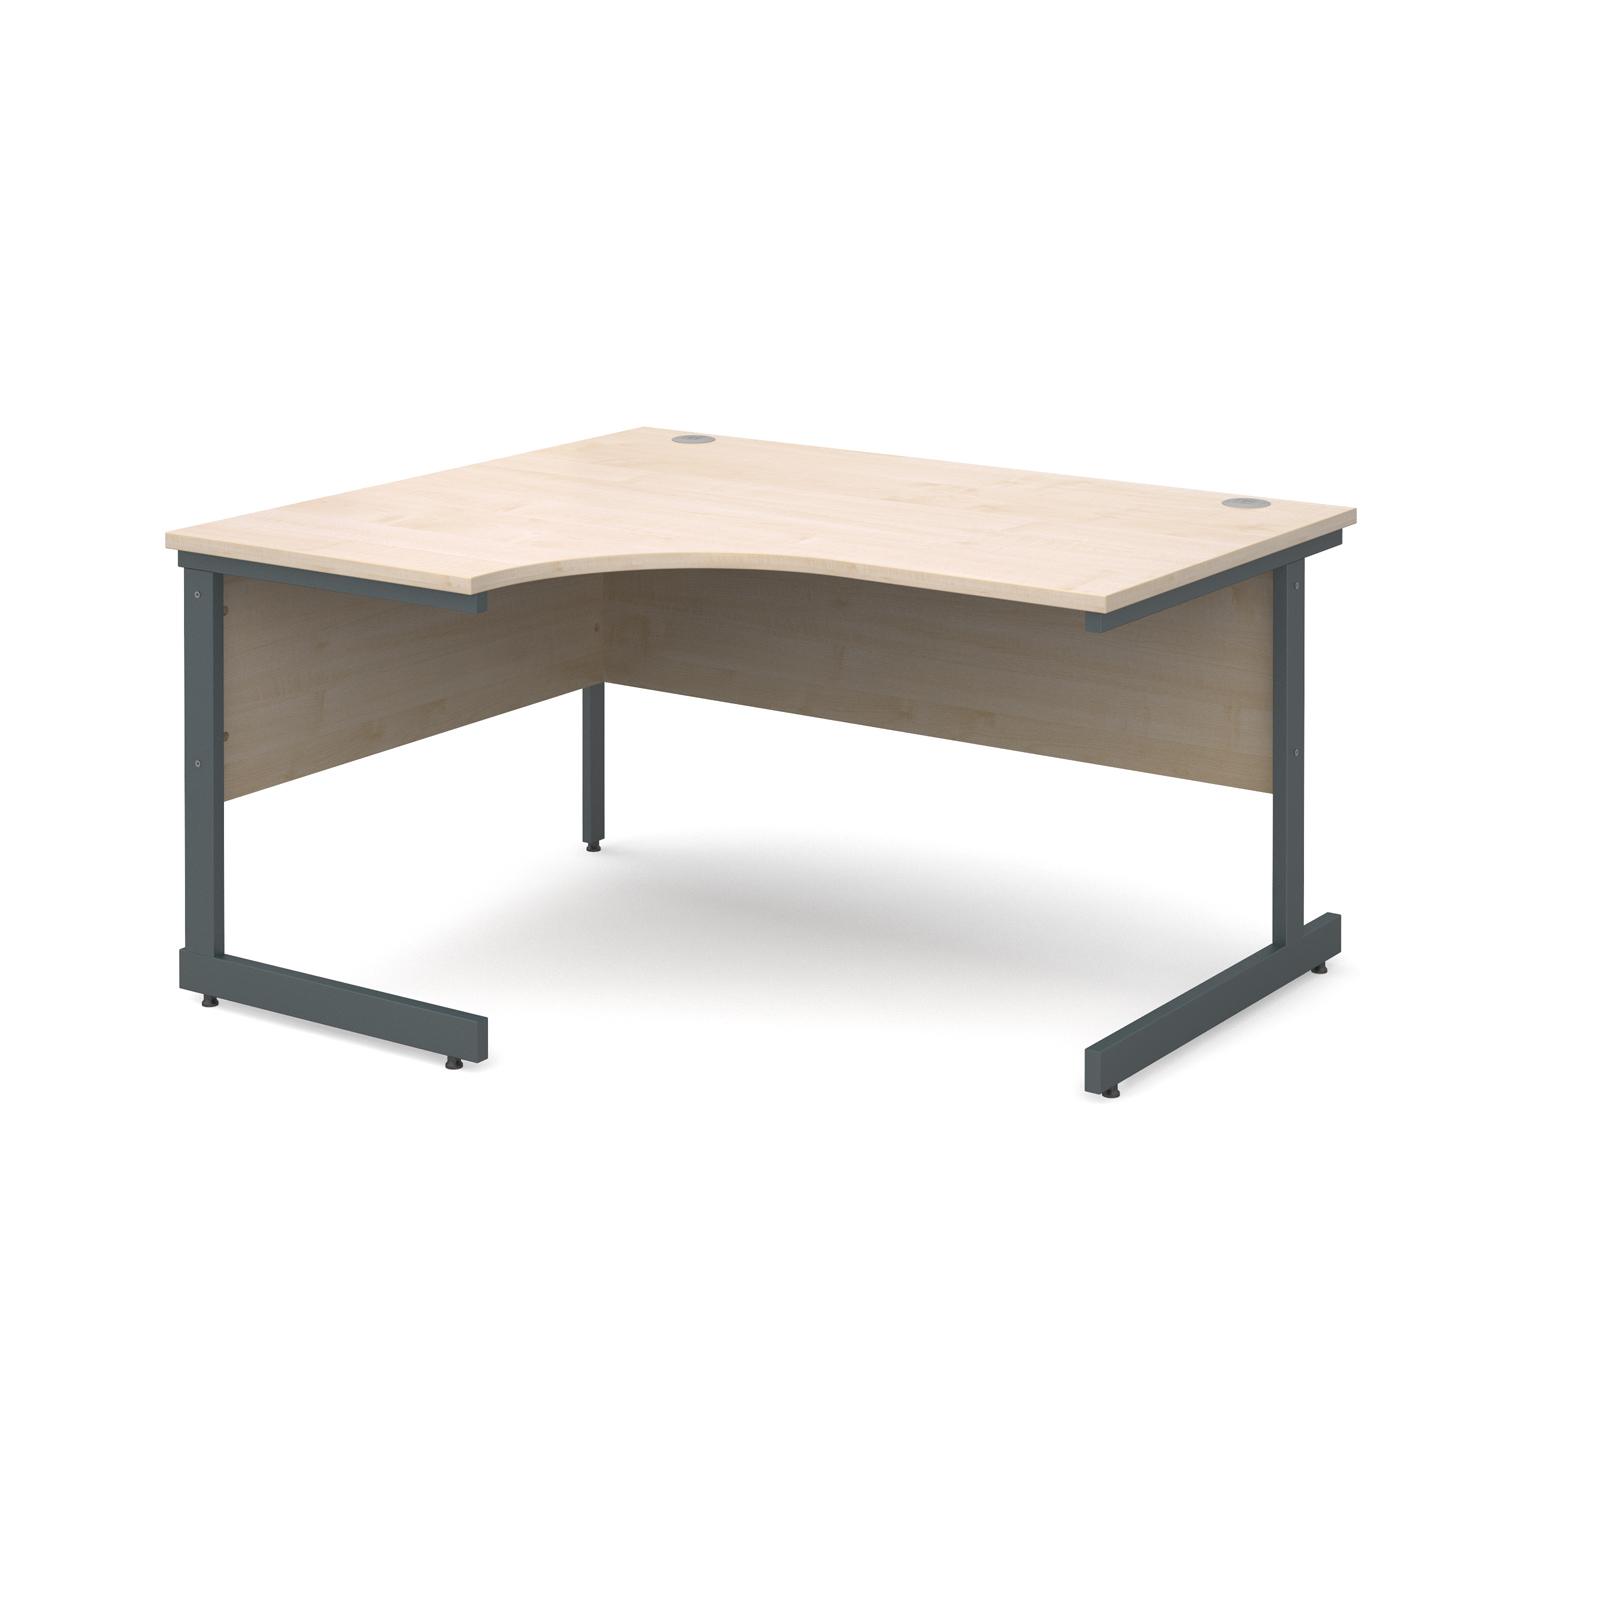 Contract 25 left hand ergonomic desk 1400mm - graphite cantilever frame, maple top